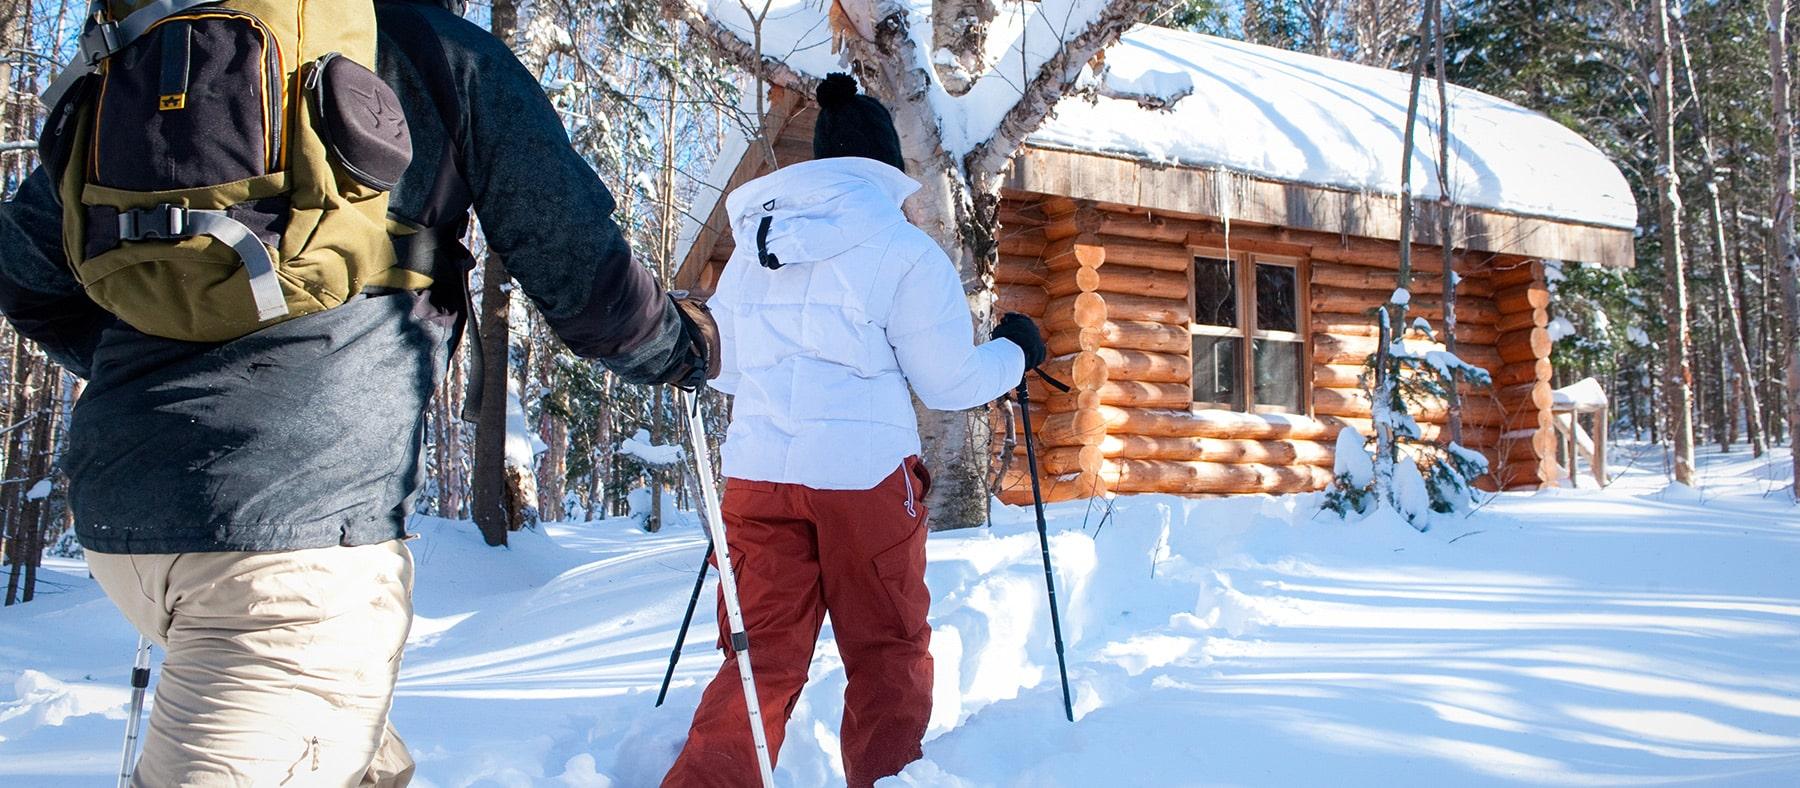 ski-tourisme-laurentides-quebec-le-mag